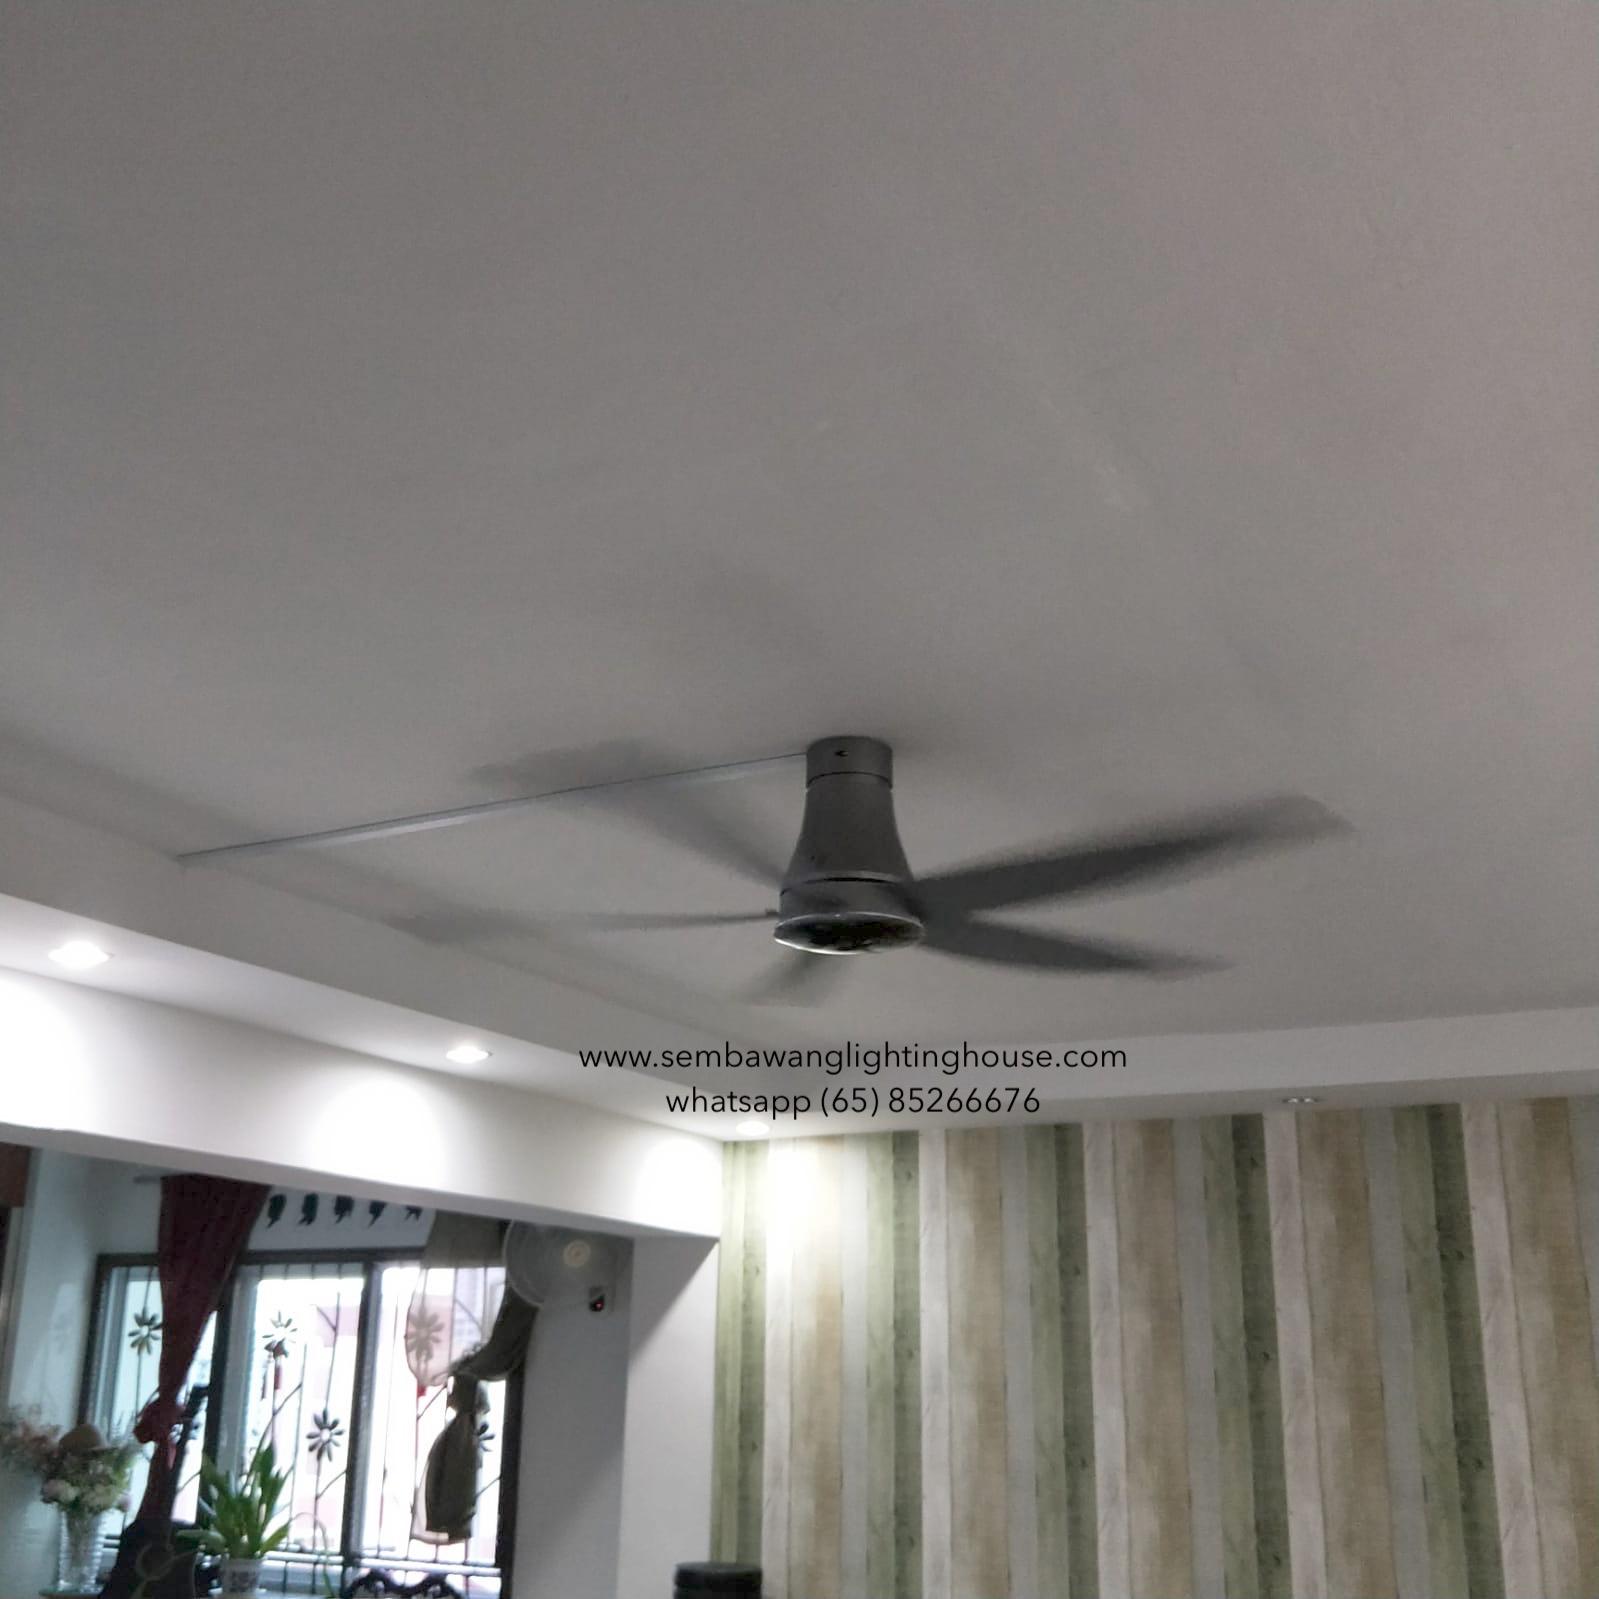 kdk-t60aw-ceiling-fan-without-light-sembawang-lighting-house-sample-10.jpg